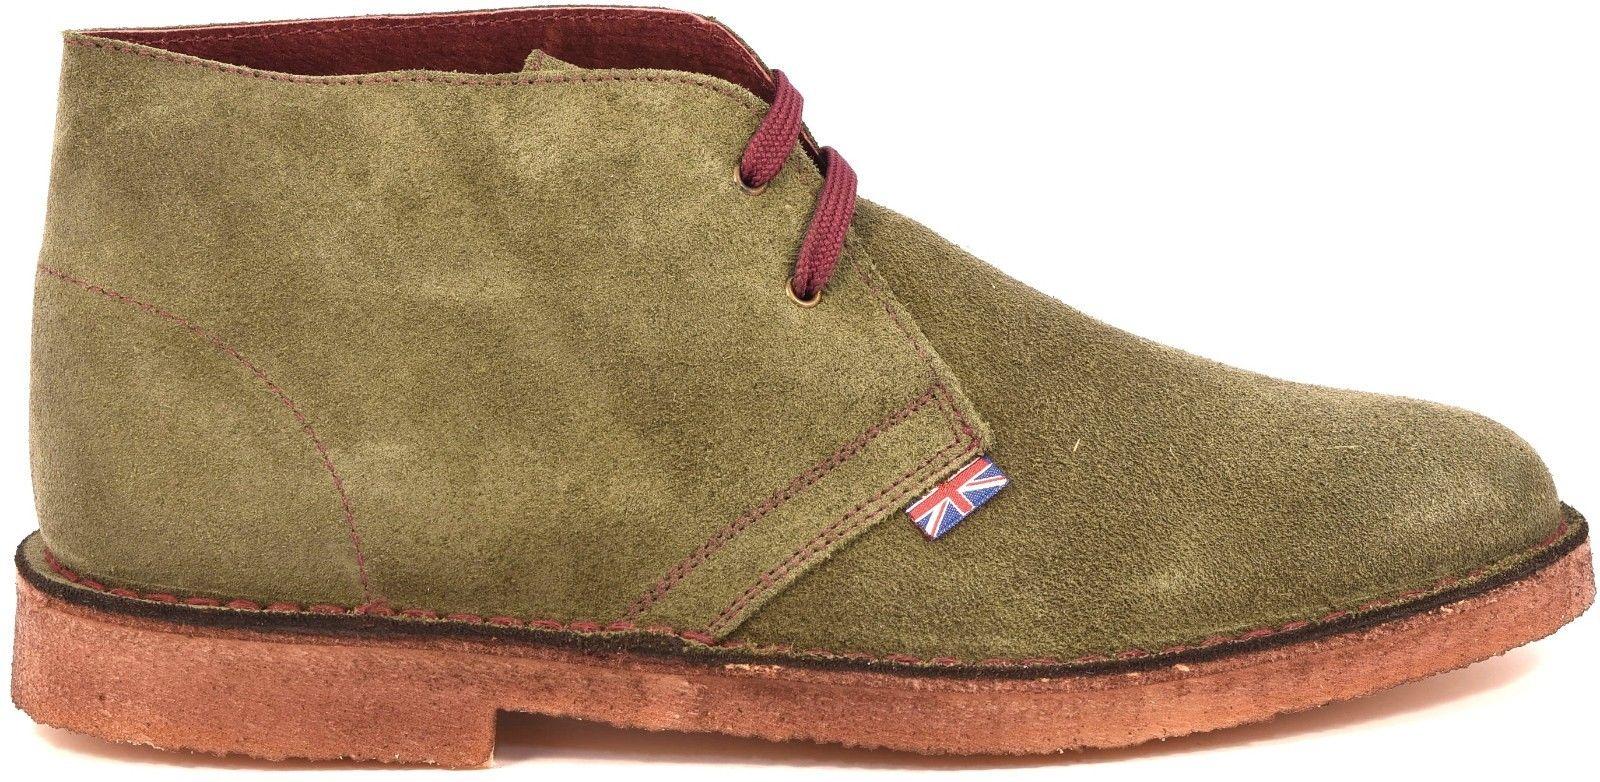 Shoesmyfriends Natural it Verde Safari 1887 OvzwqtA0